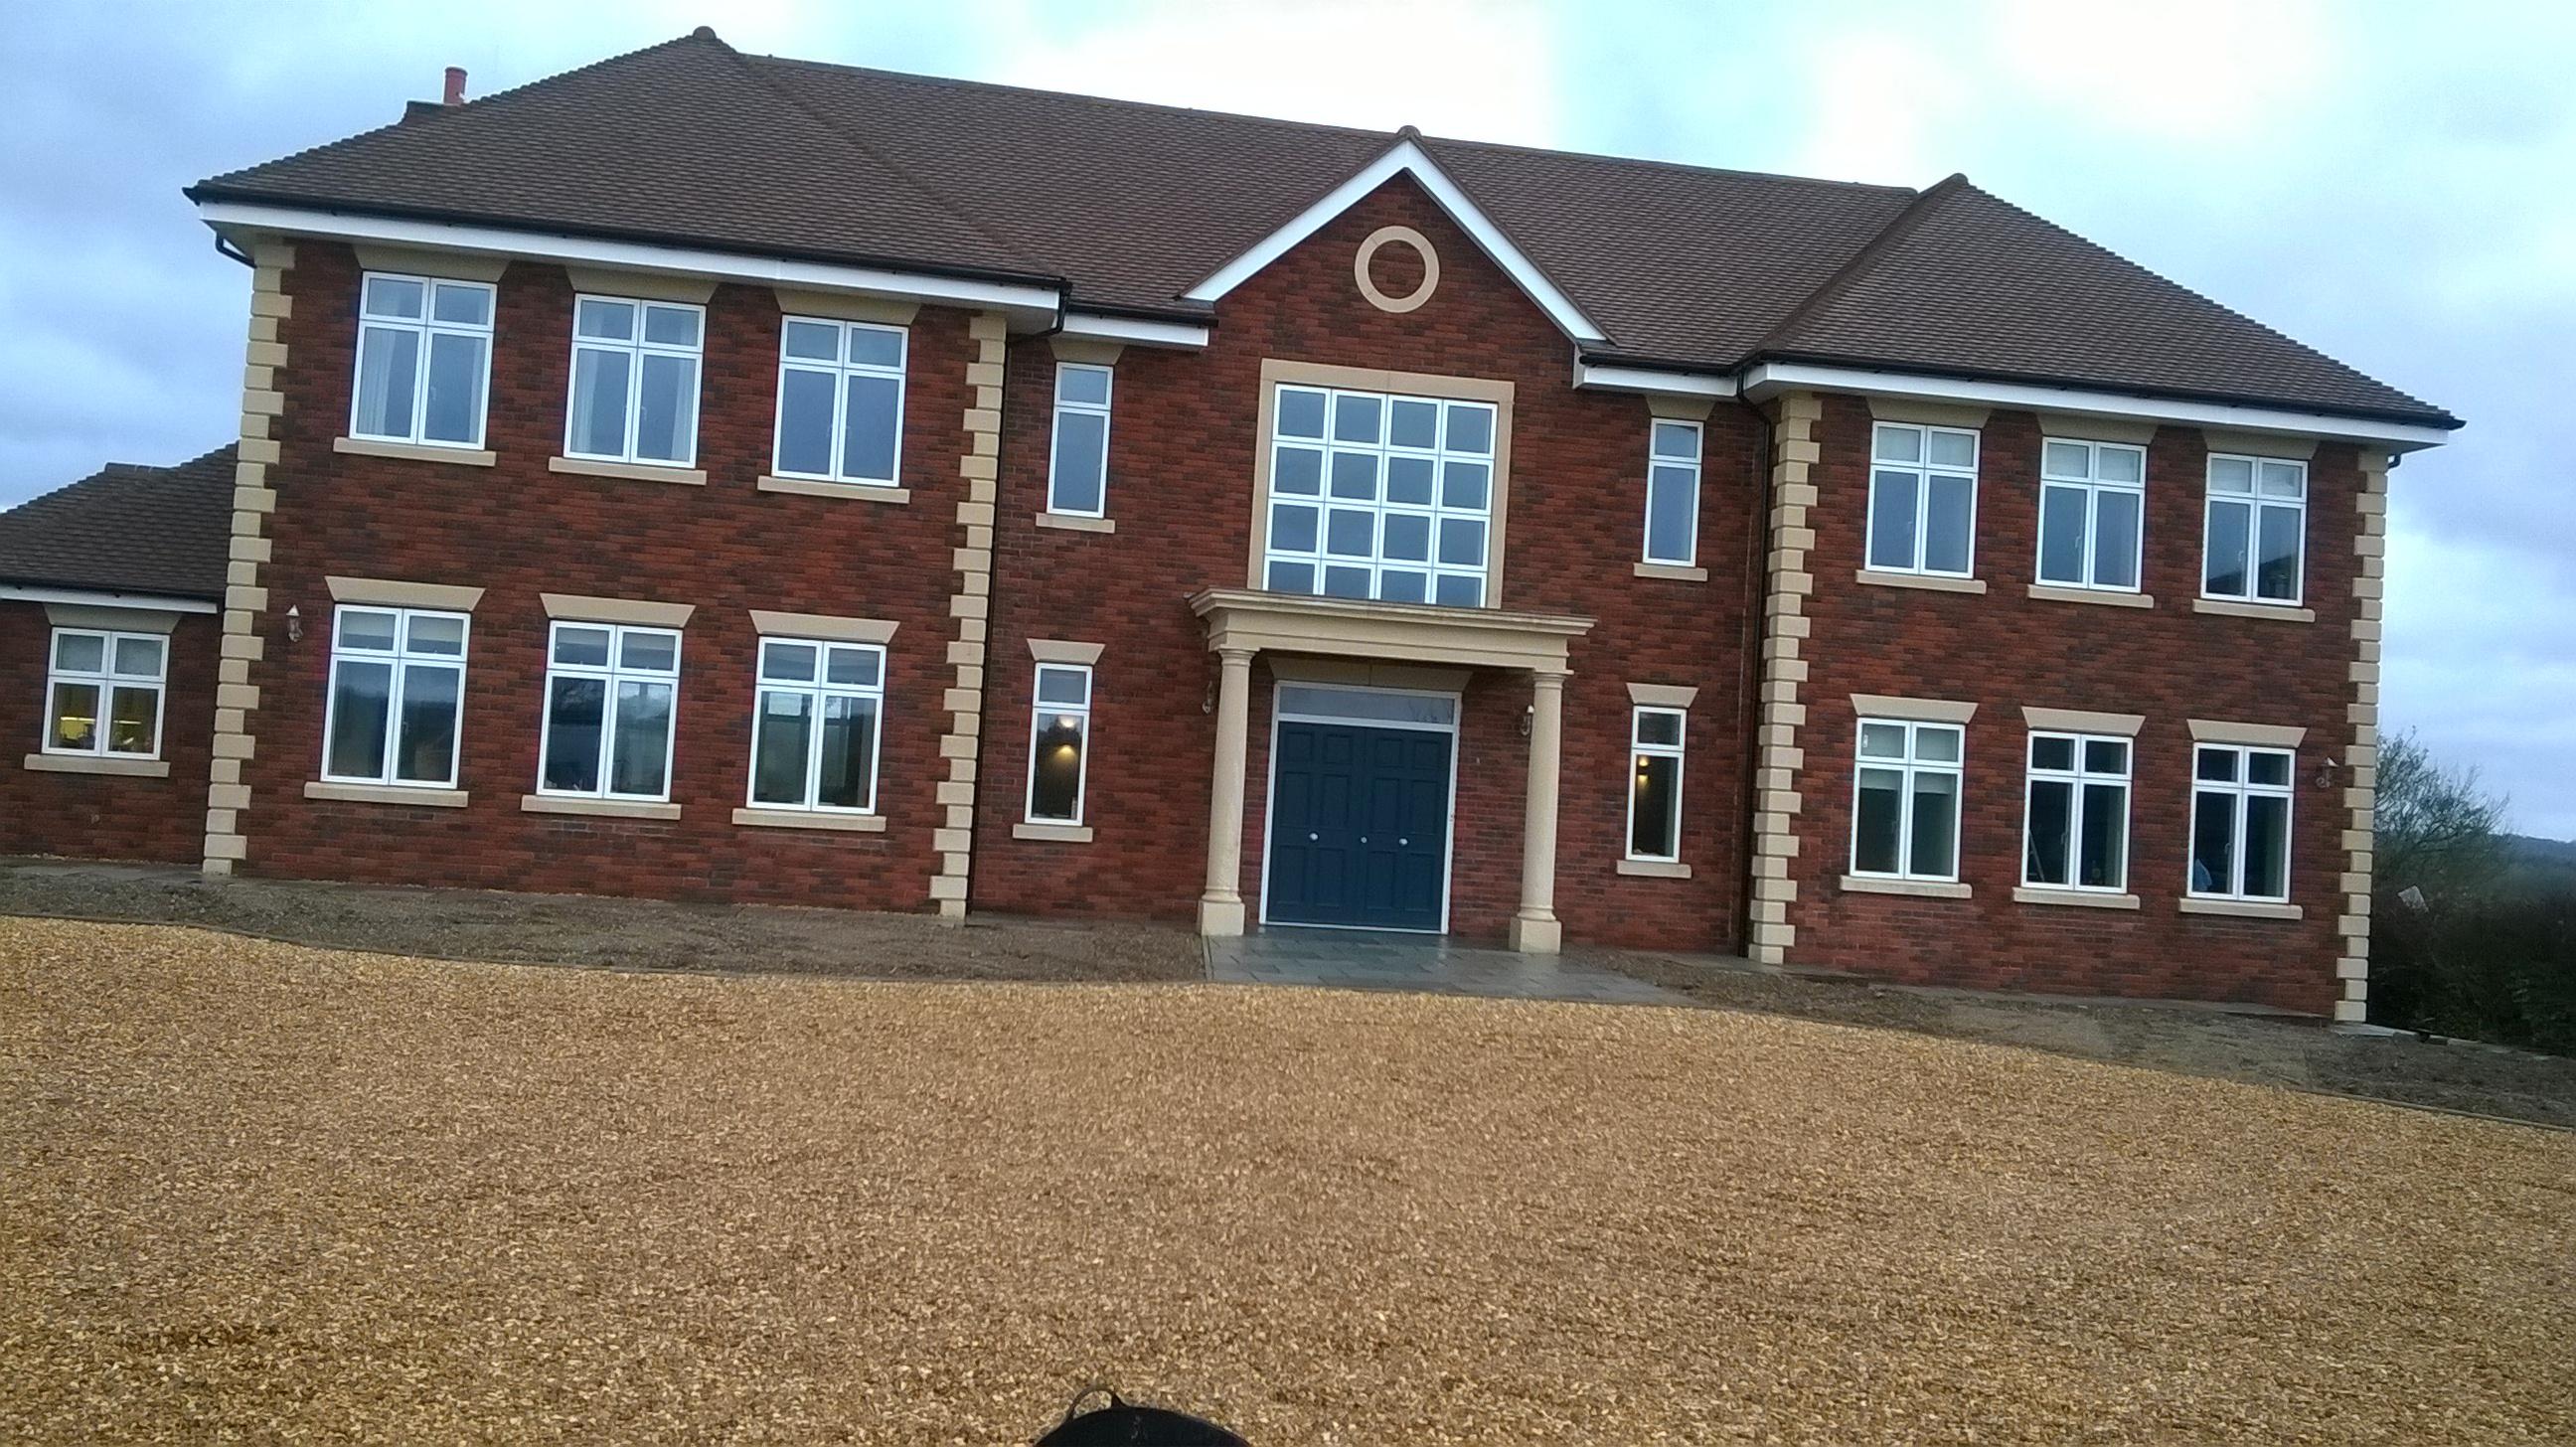 New property development